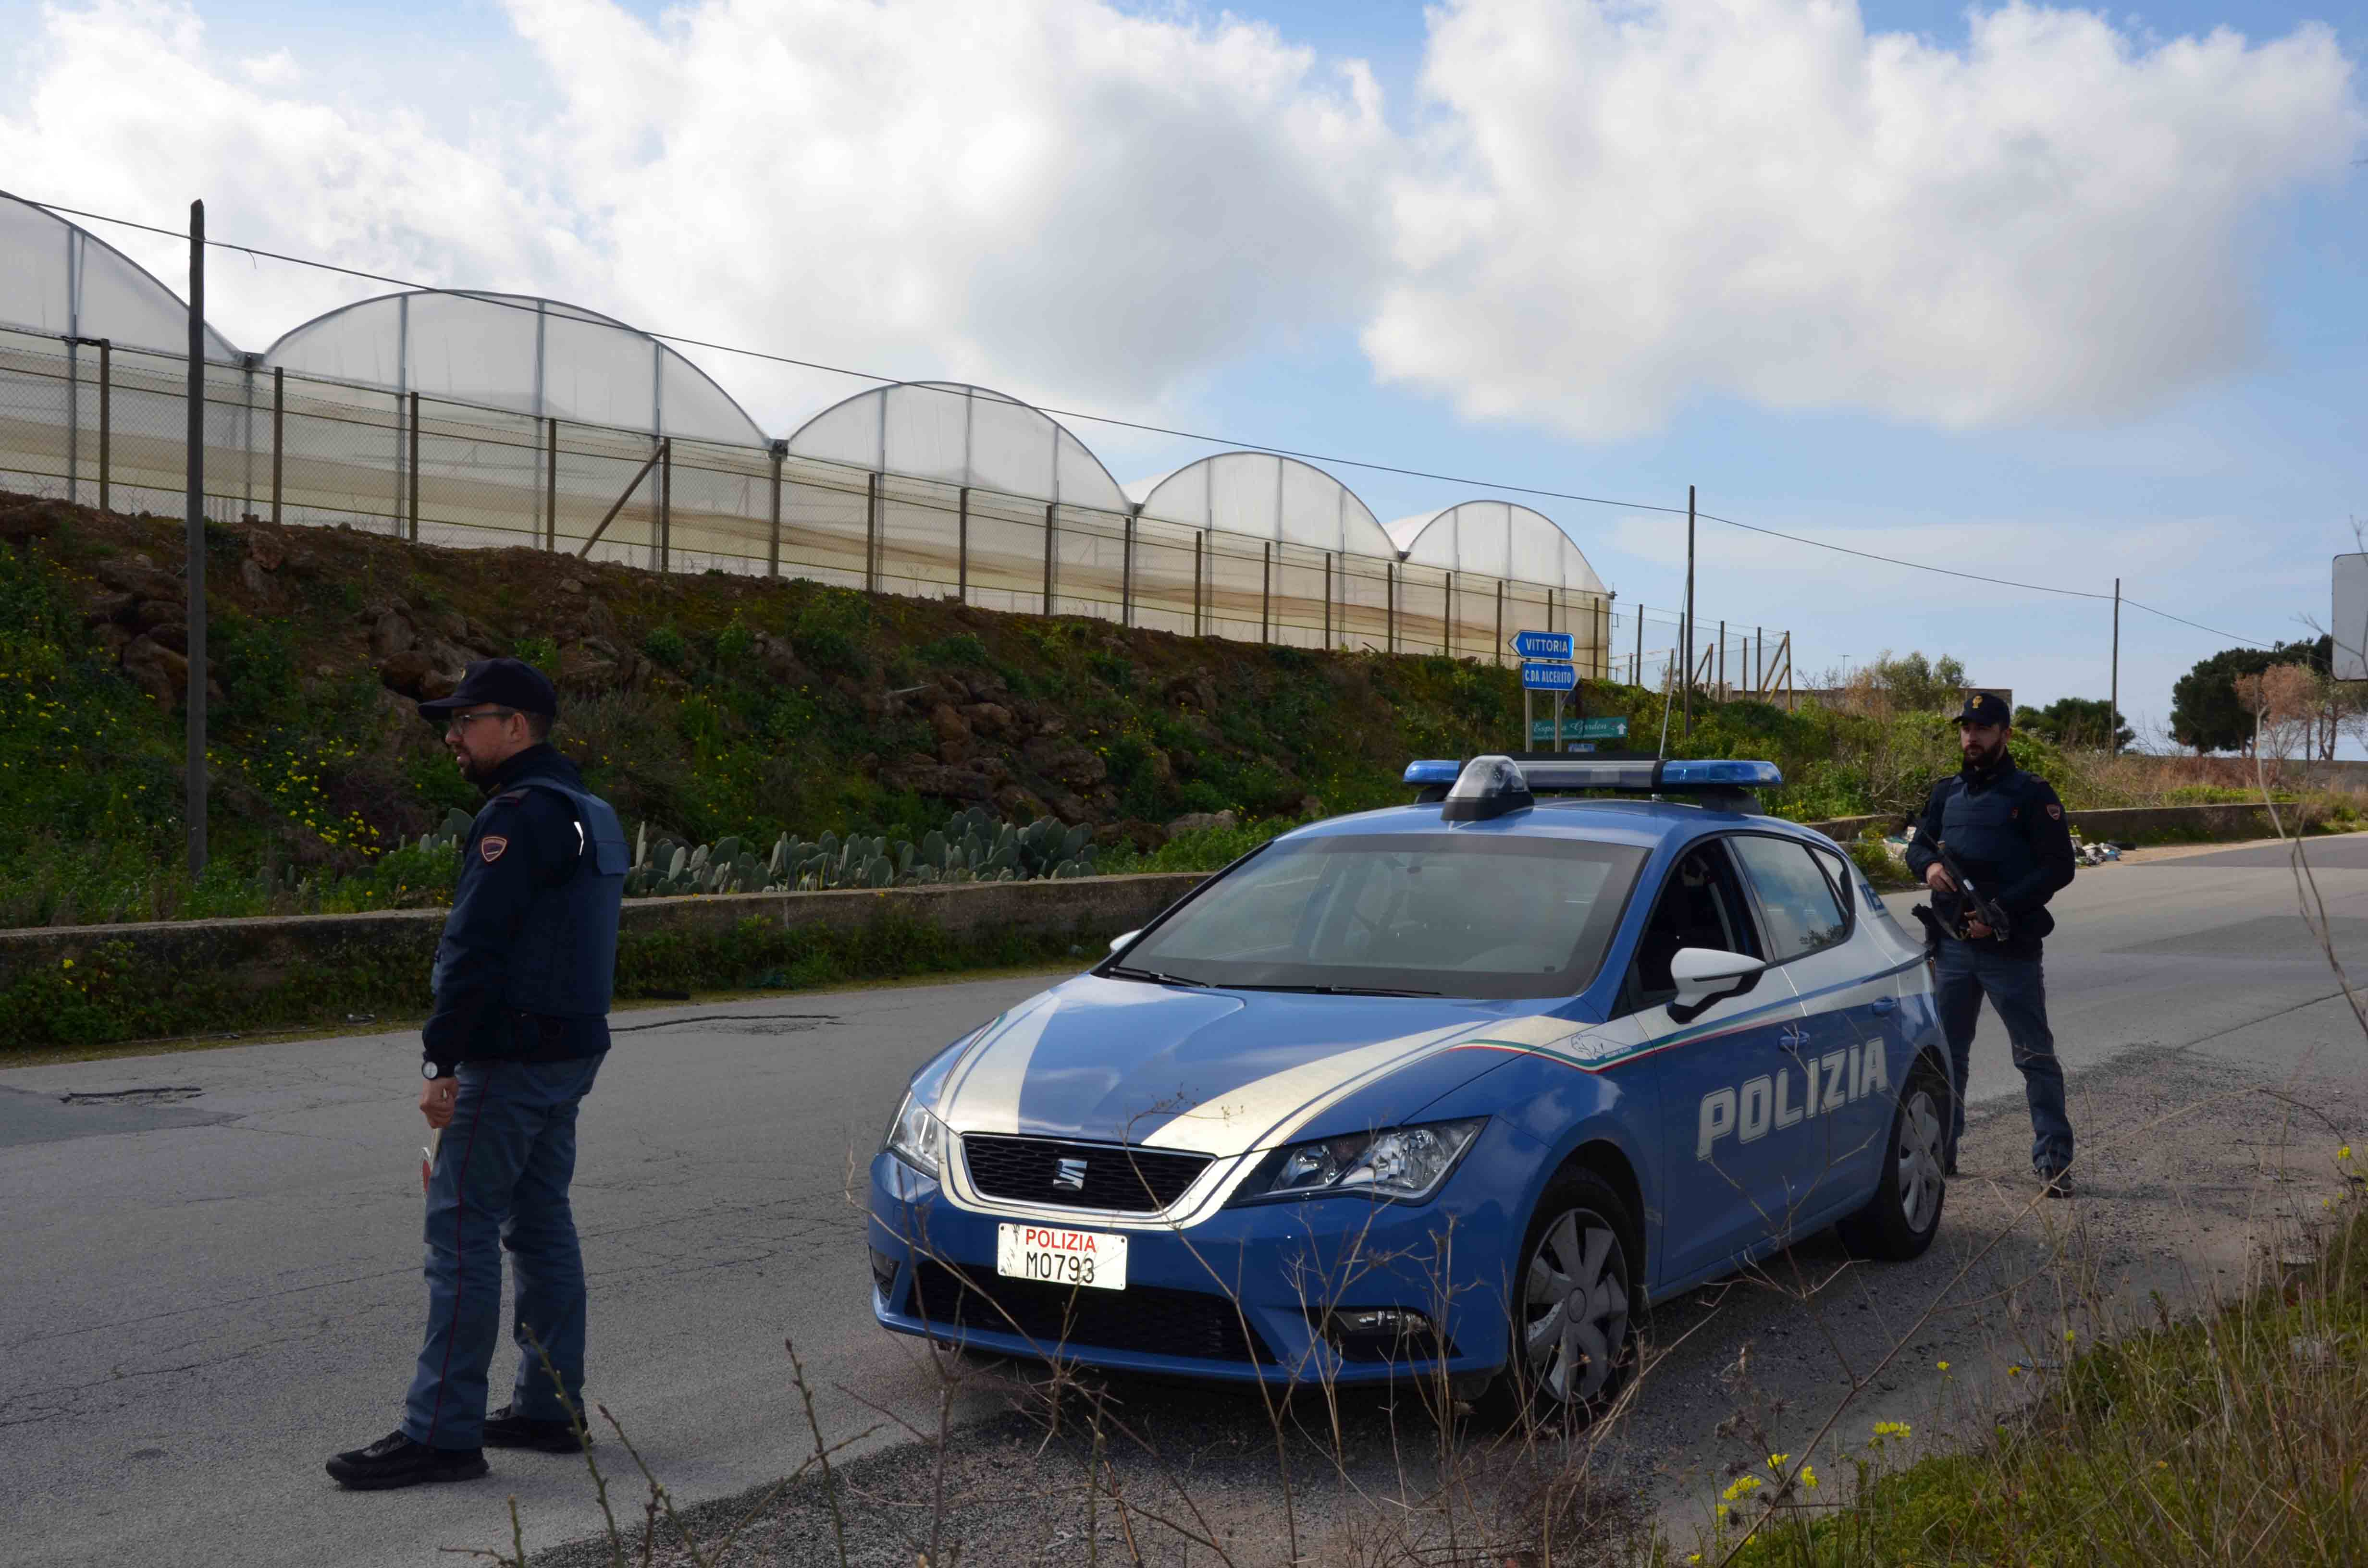 Controlli nelle campagne tra Vittoria e Acate: 6 persone denunciate